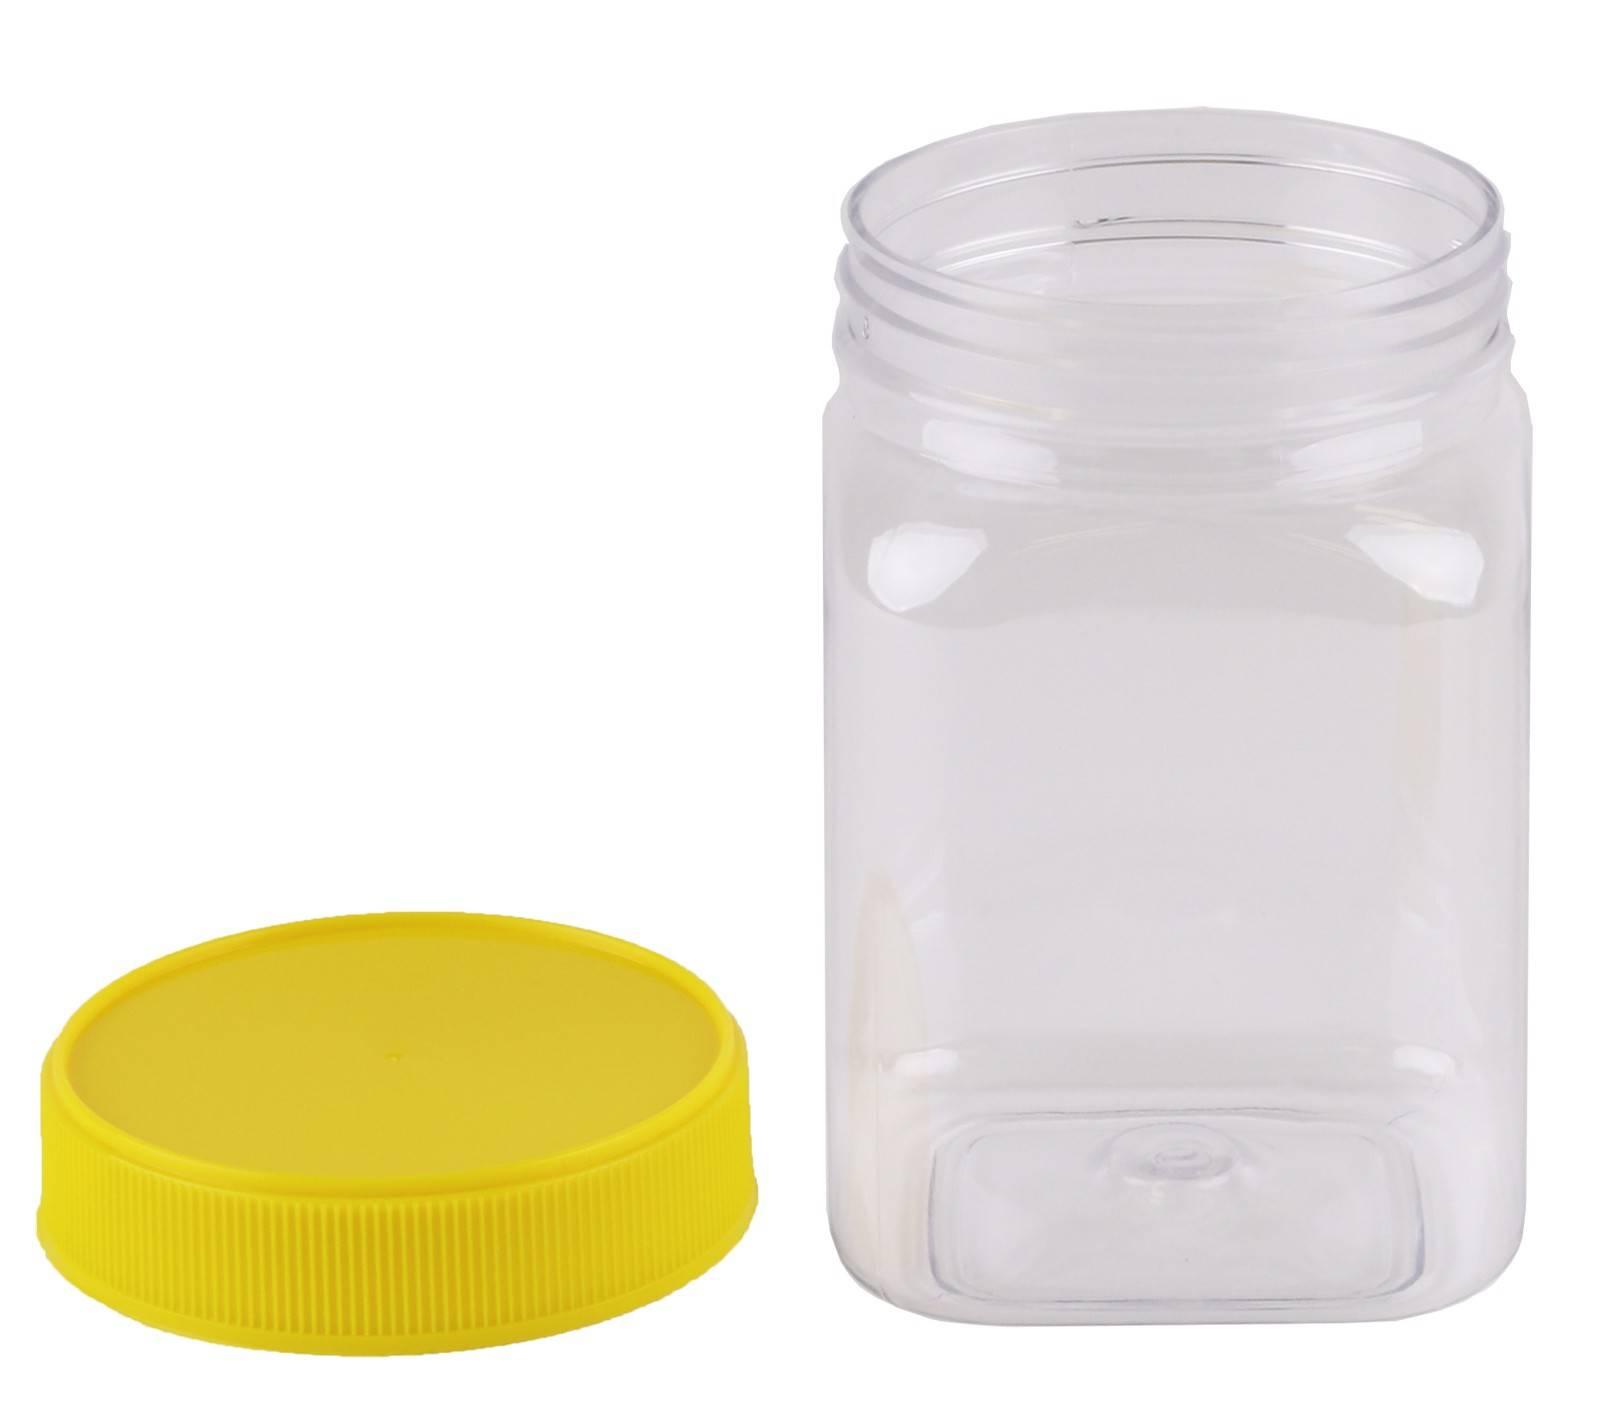 Plastic Honey Jar 500gm Square Yellow Lid, Food Grade, Carton 210 pcs, Jars & Lids